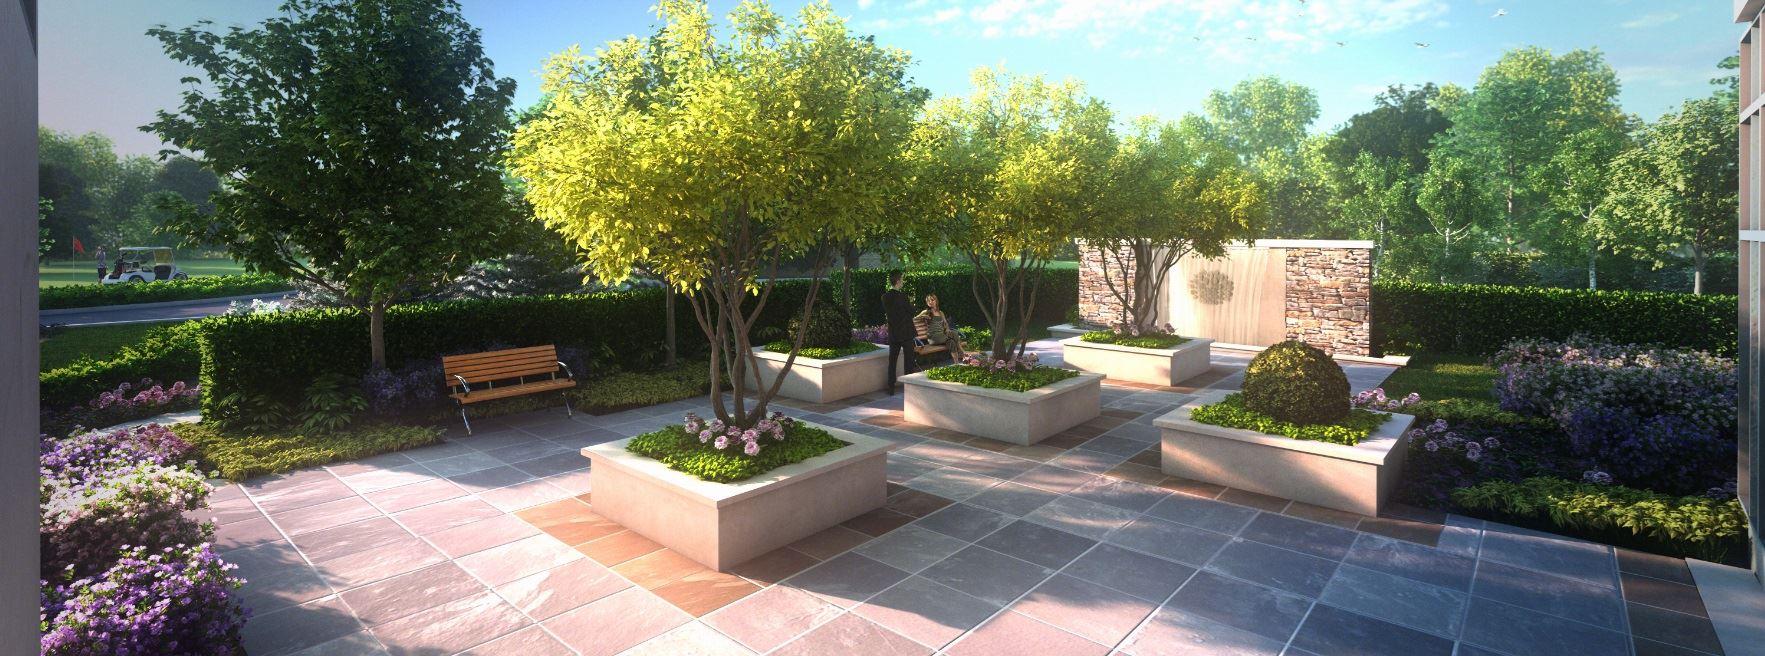 Exterior rendering of Upper Vista Condos garden.